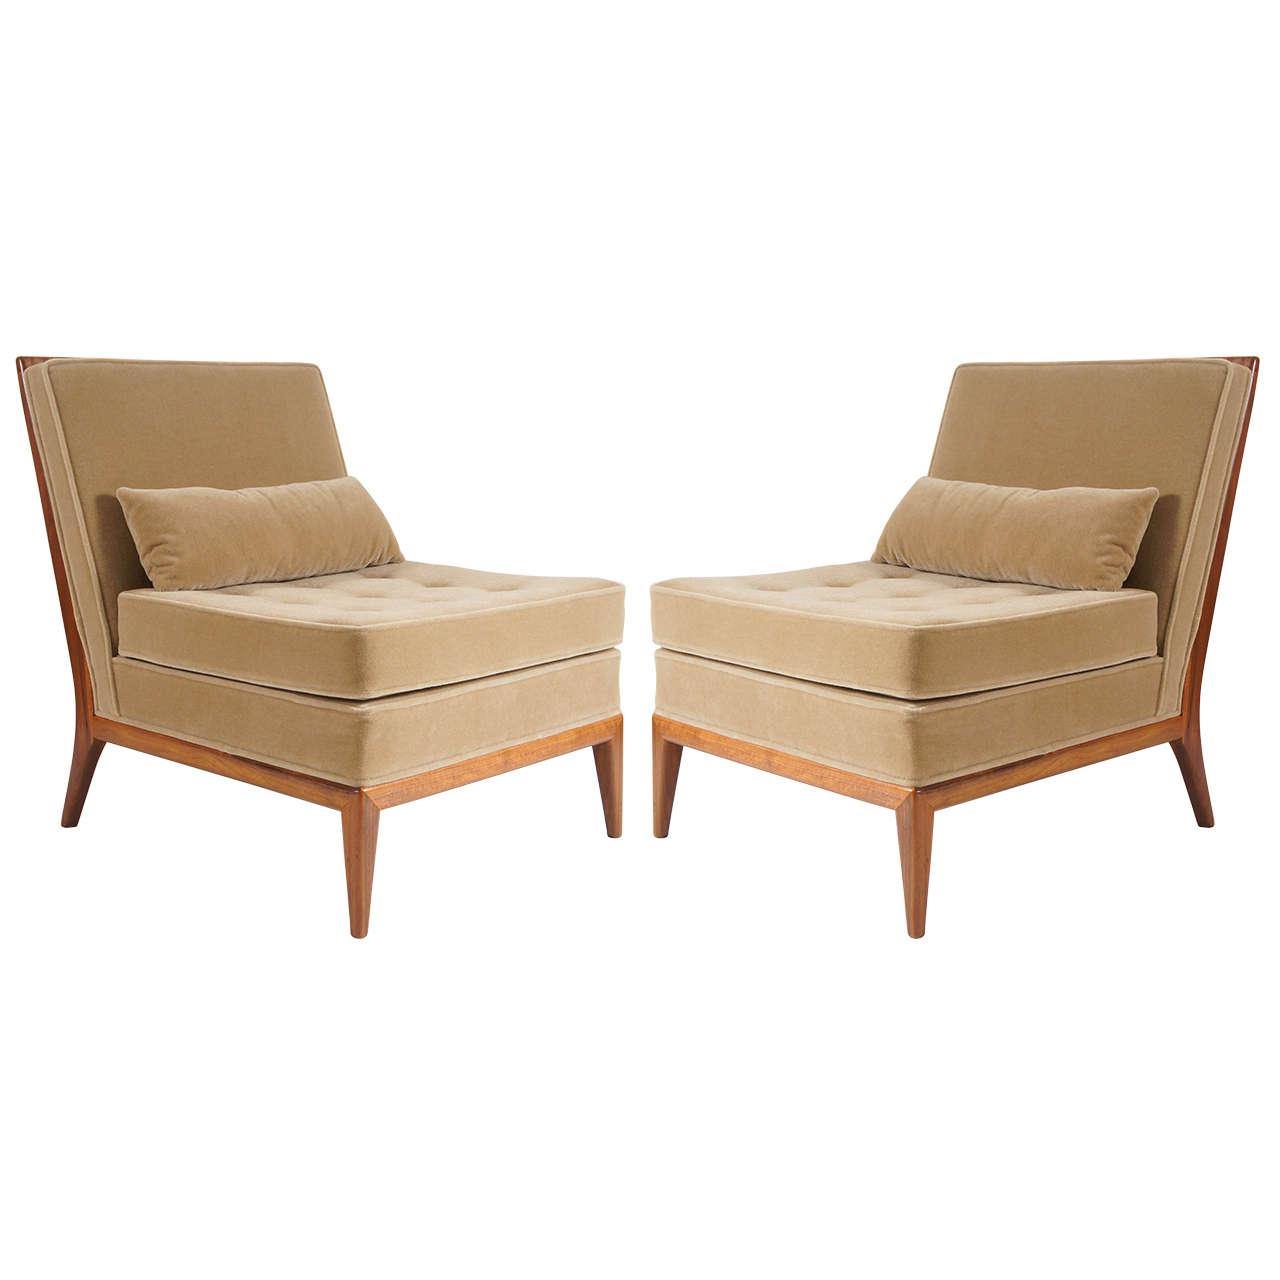 Cool Mid Century Modern Pair Of Mccobb Slipper Chairs Theyellowbook Wood Chair Design Ideas Theyellowbookinfo